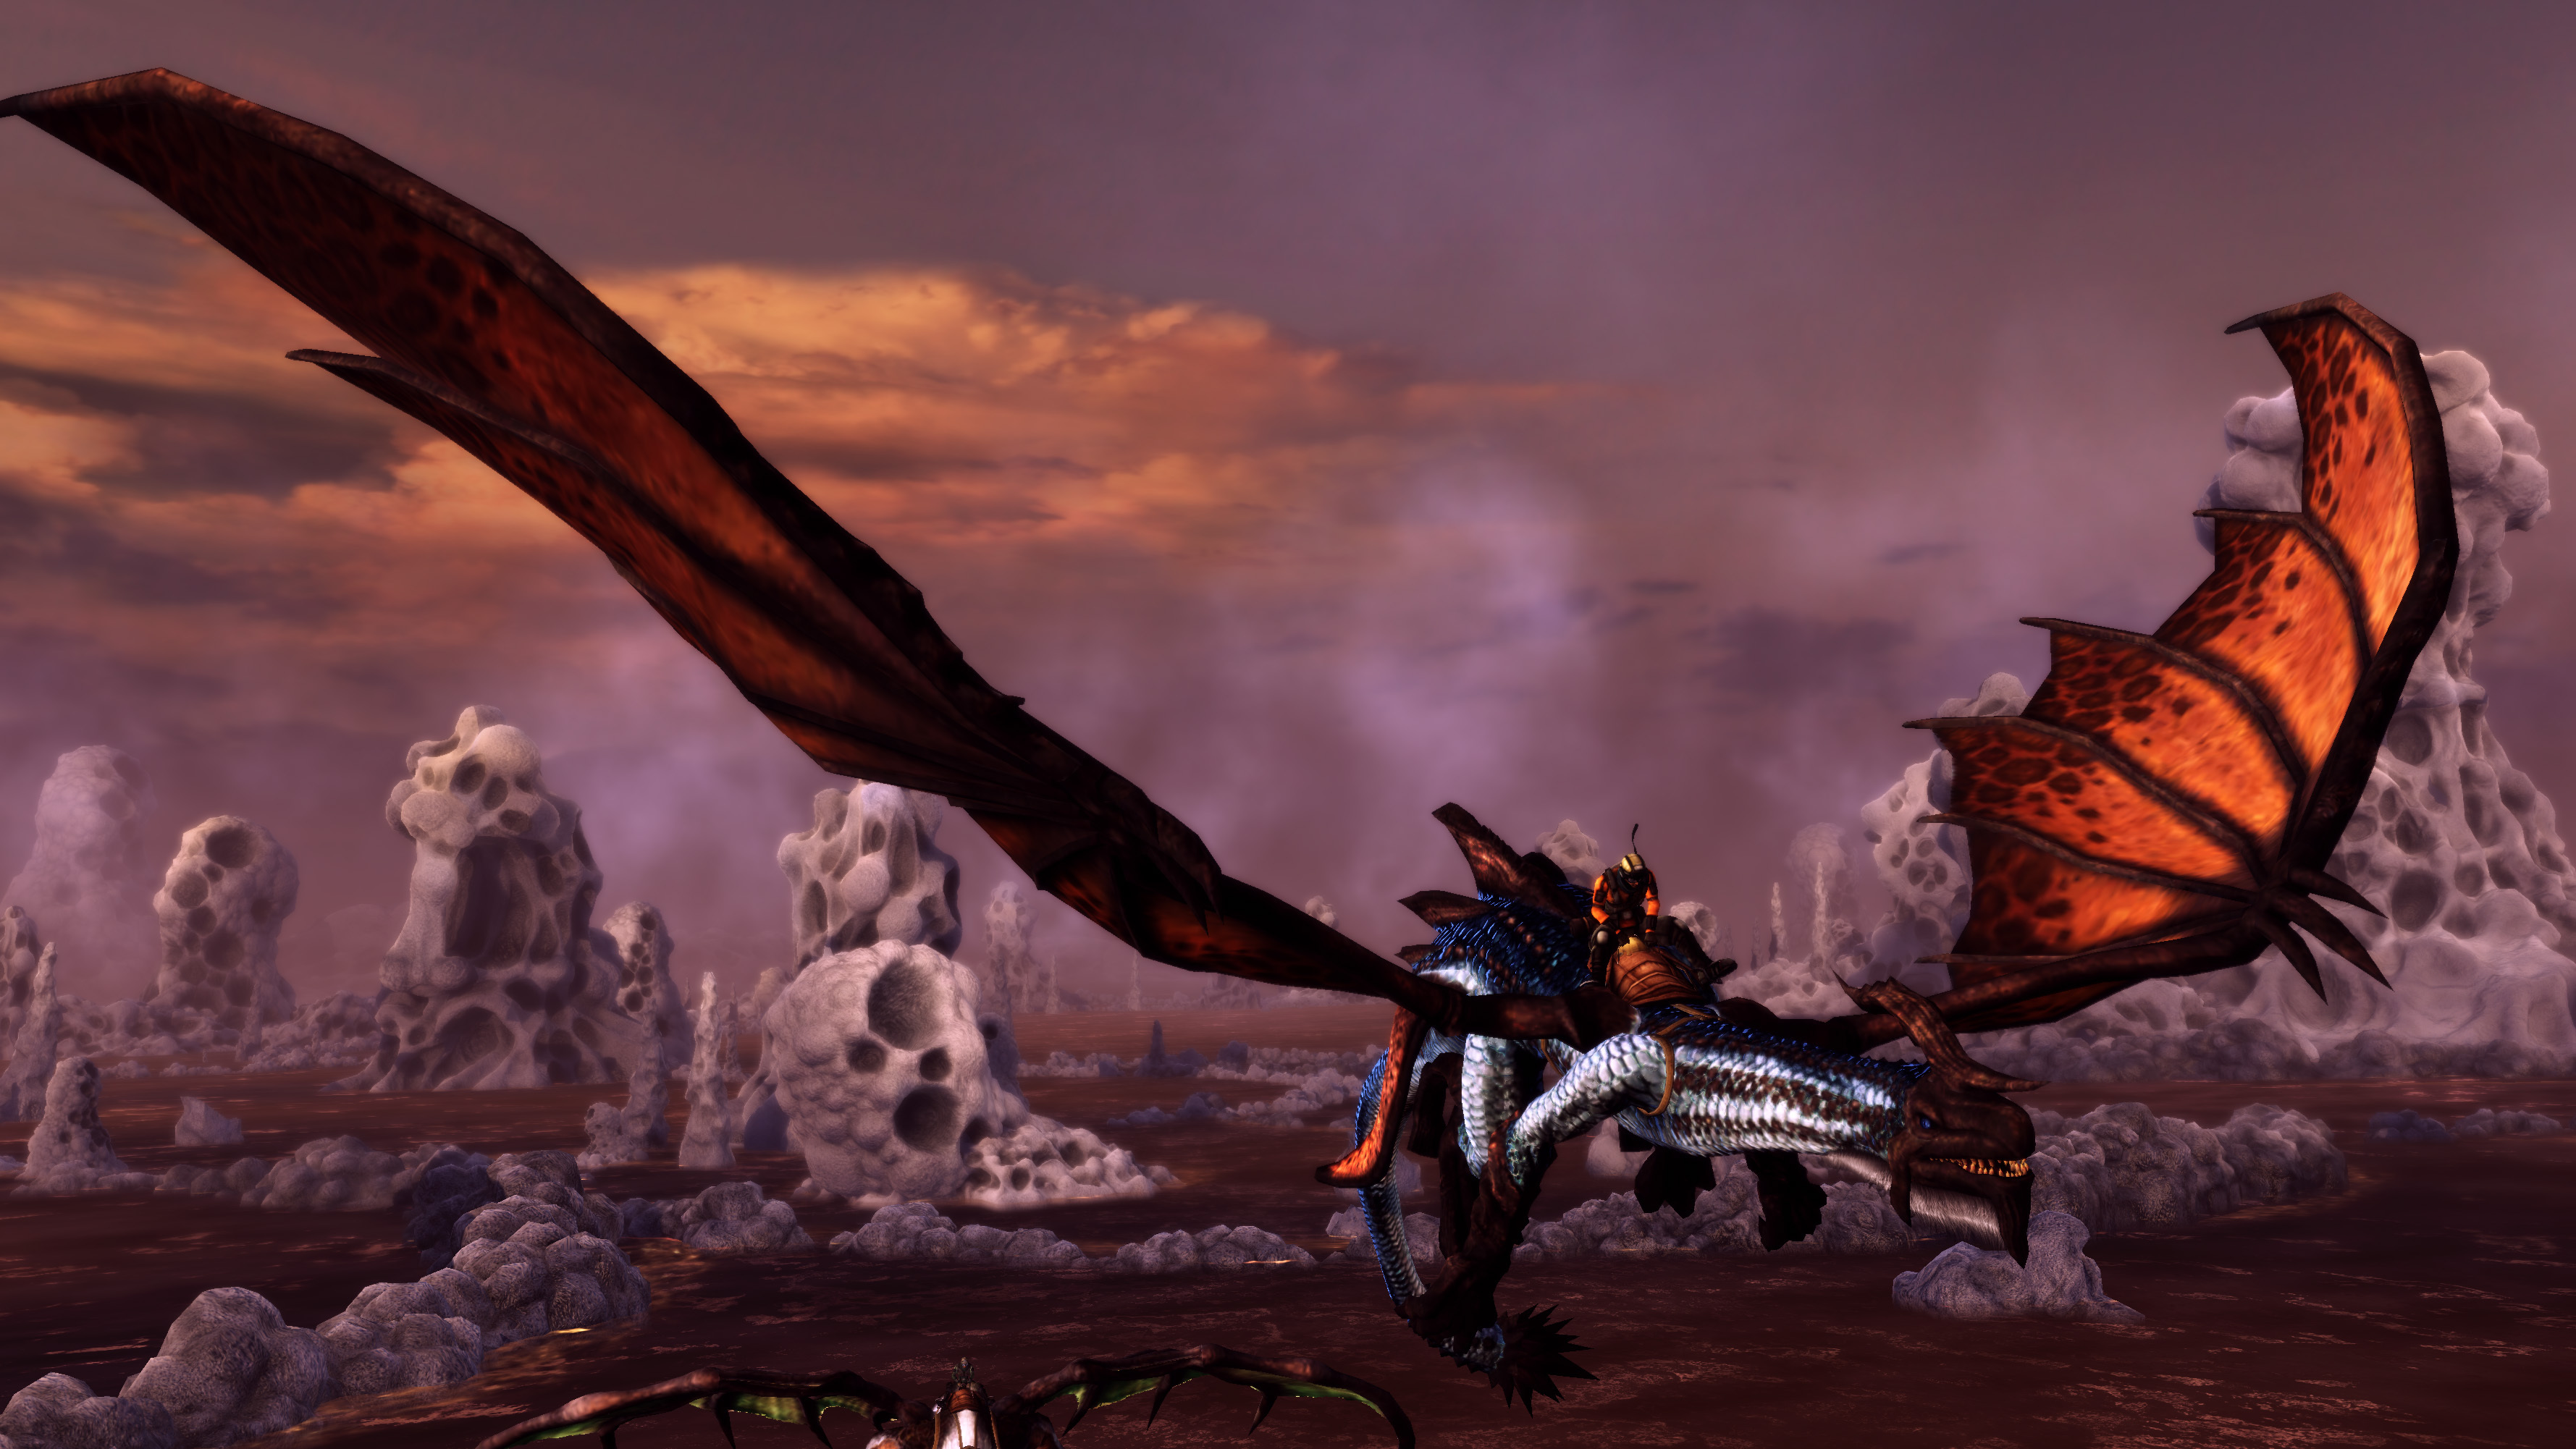 Dragon hunter скачать игру драгон хантер на андроид бесплатно.